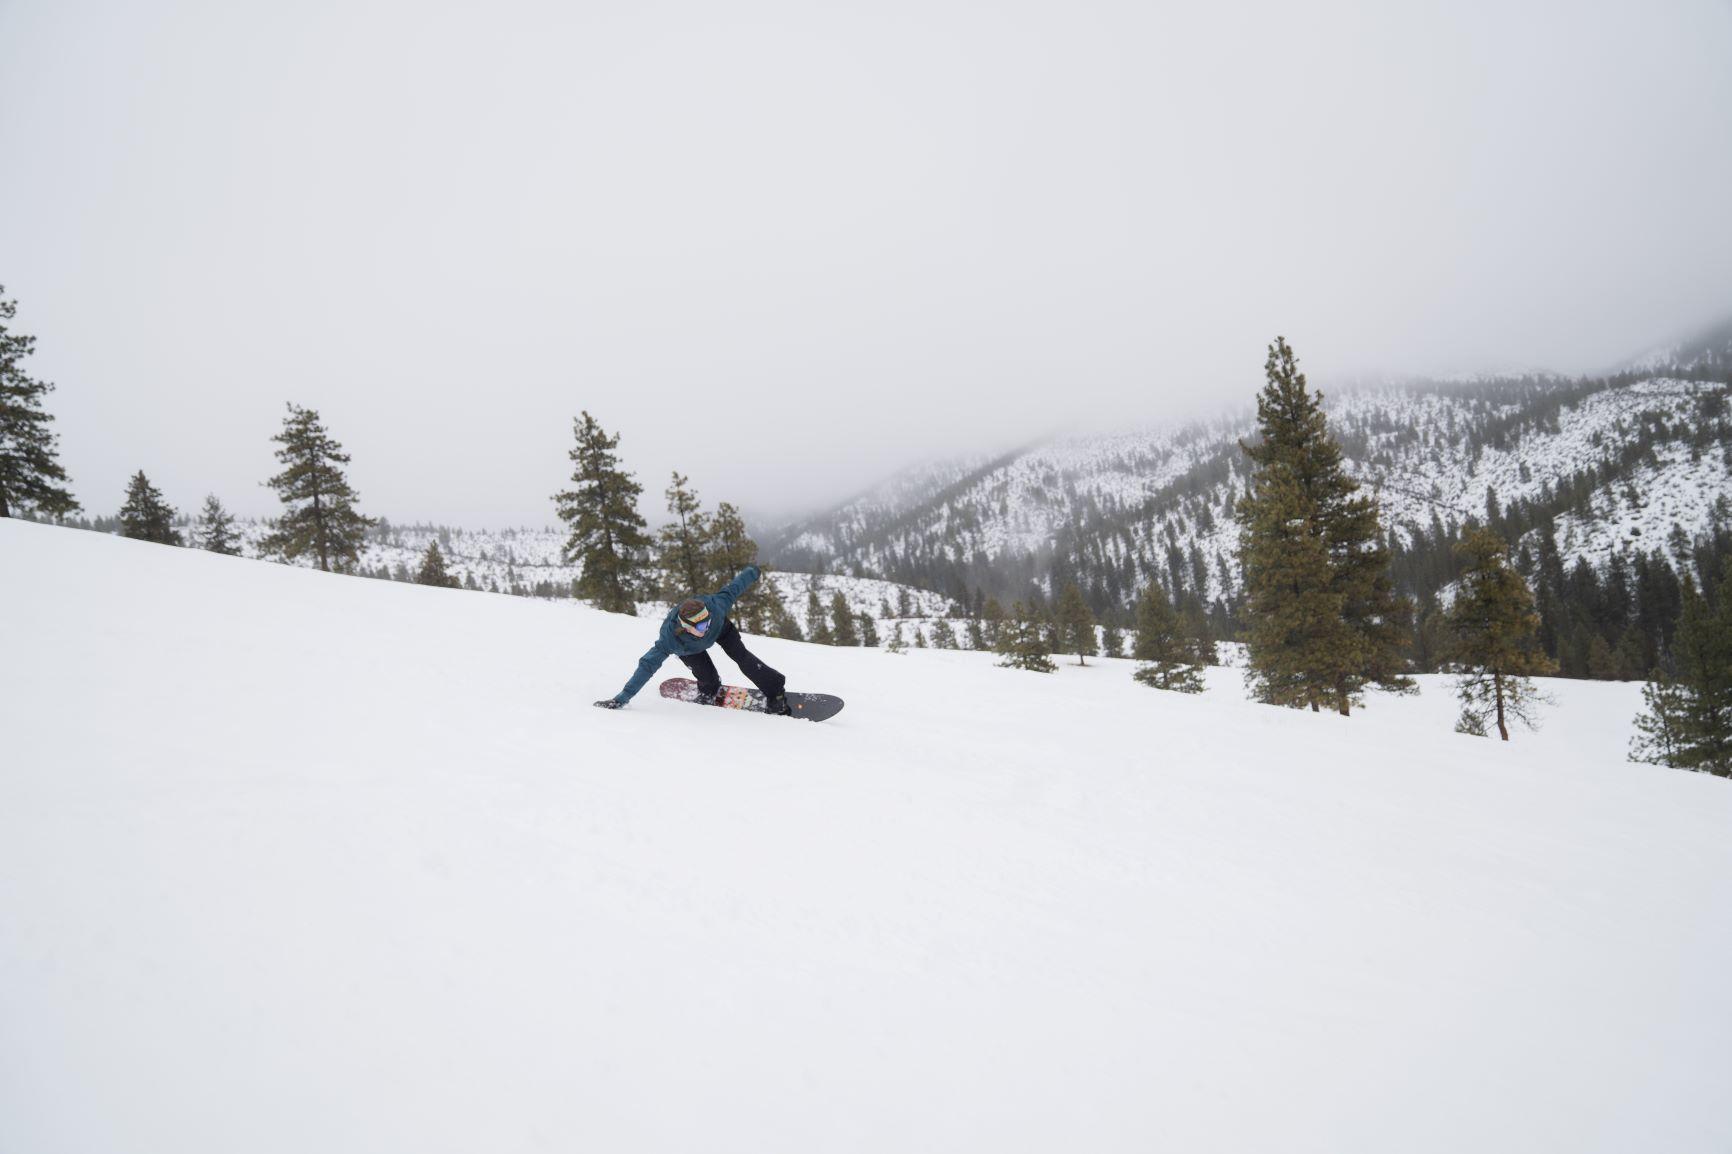 Person snowboarding down echo valley ski hill.